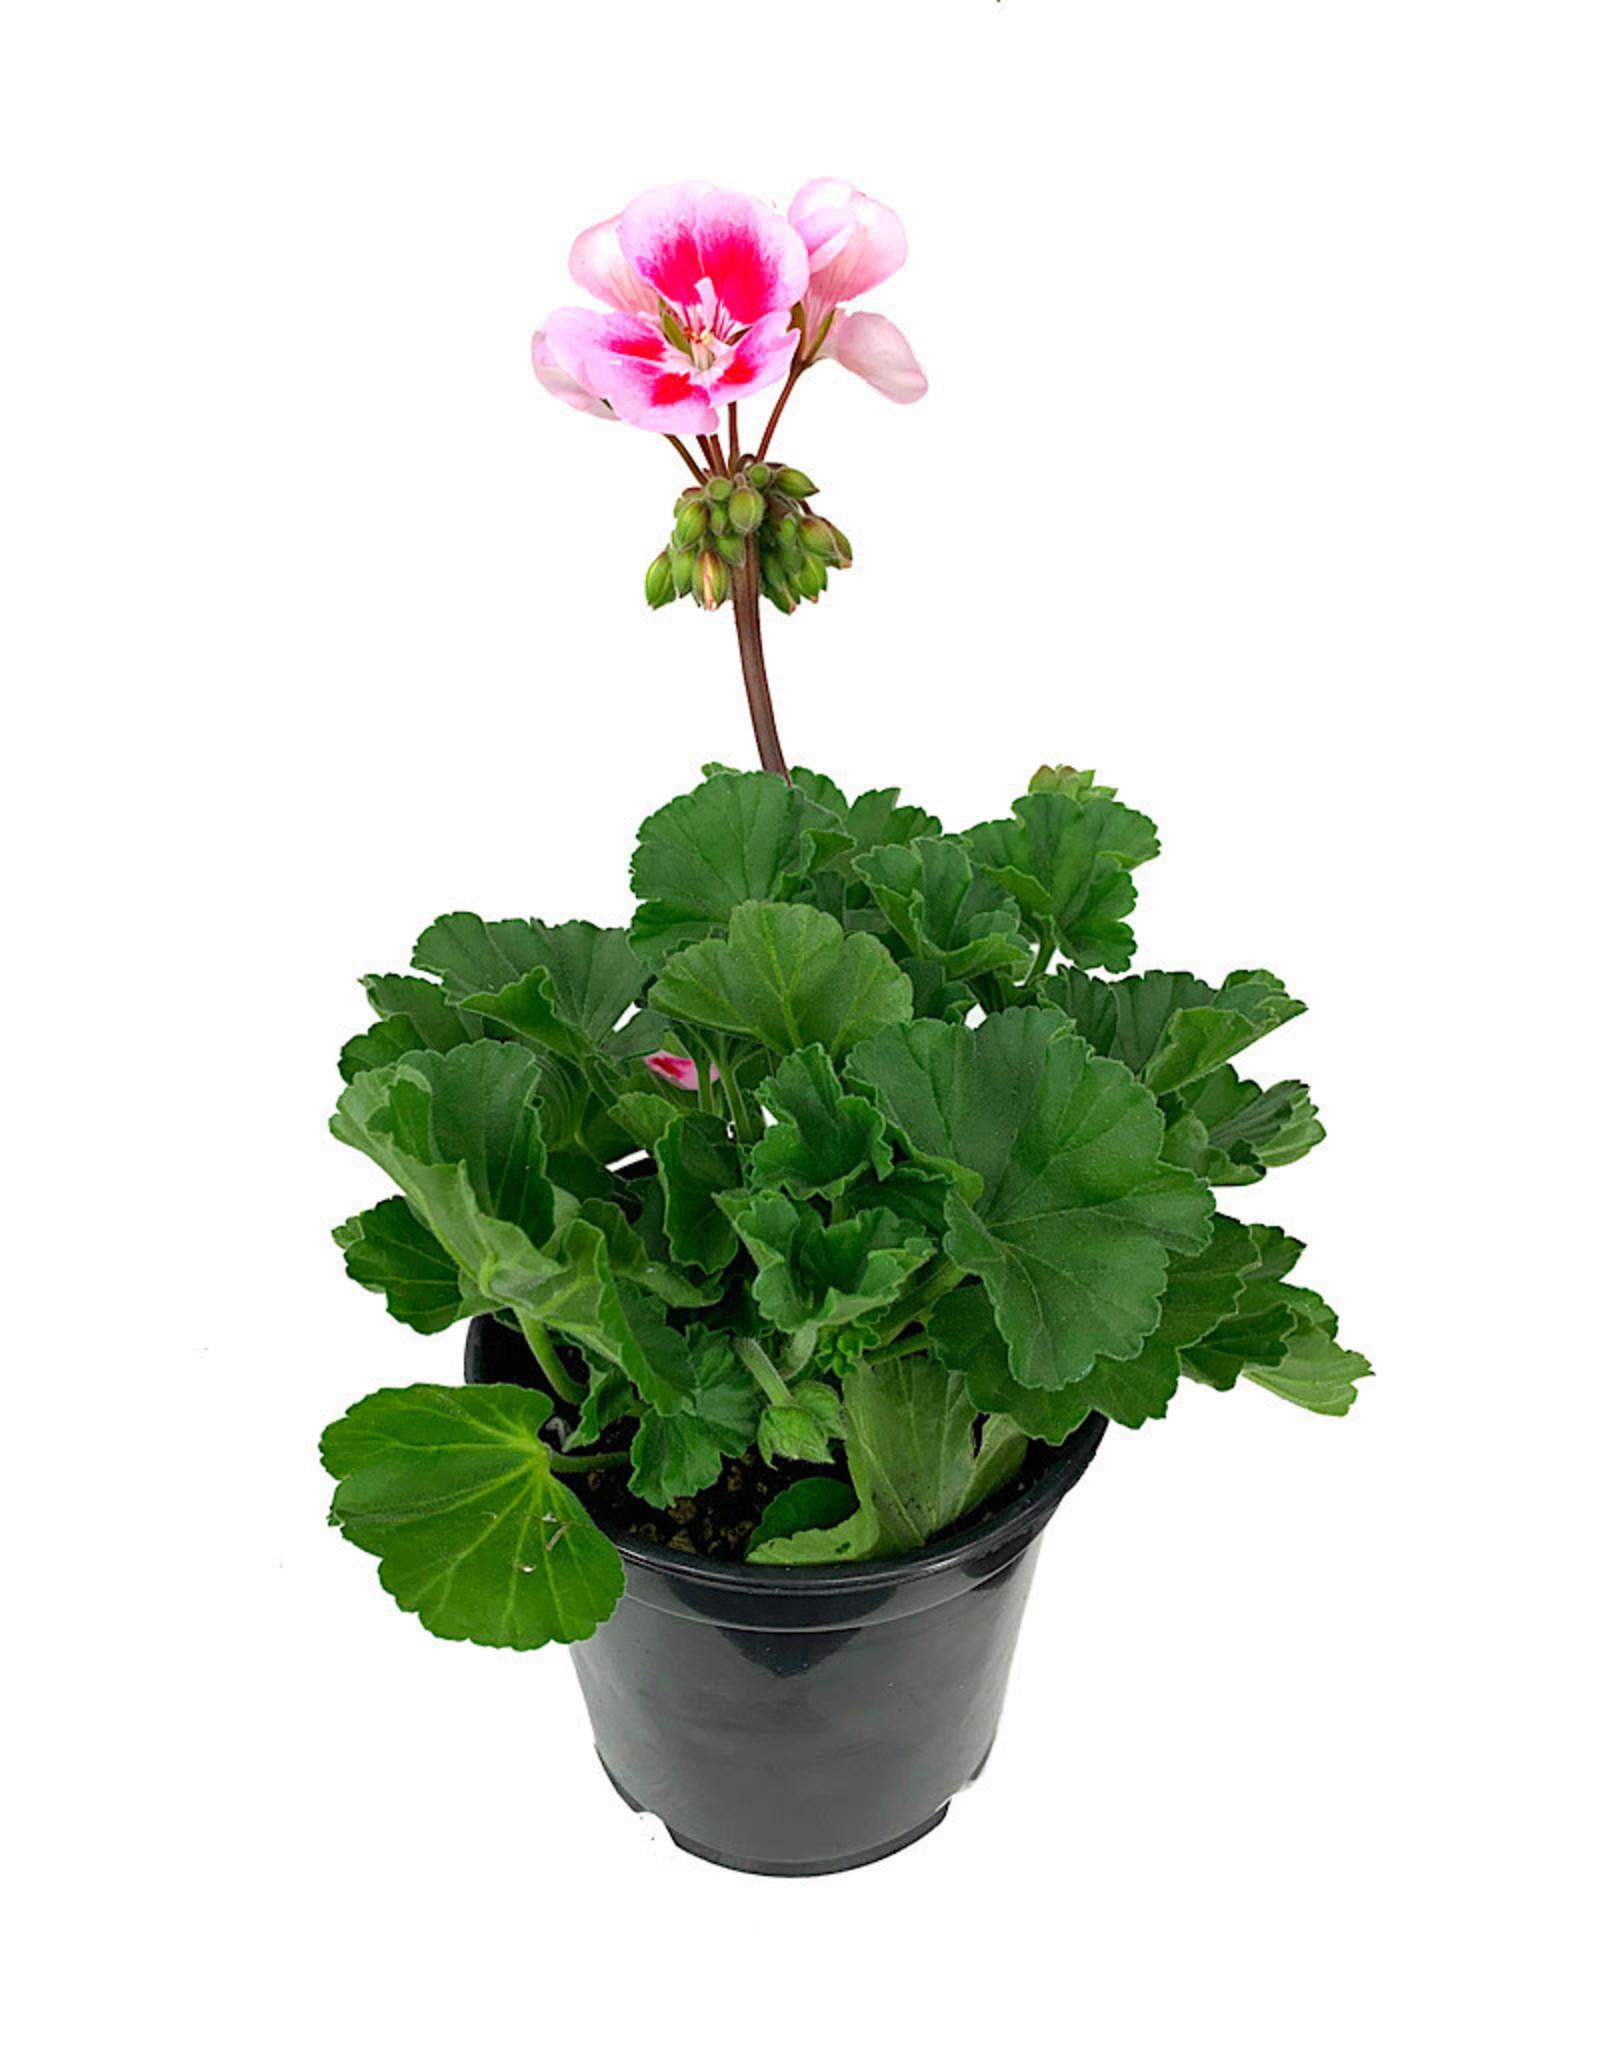 Geranium Zonal 'Presto Pink Sizzle' - 5 inch